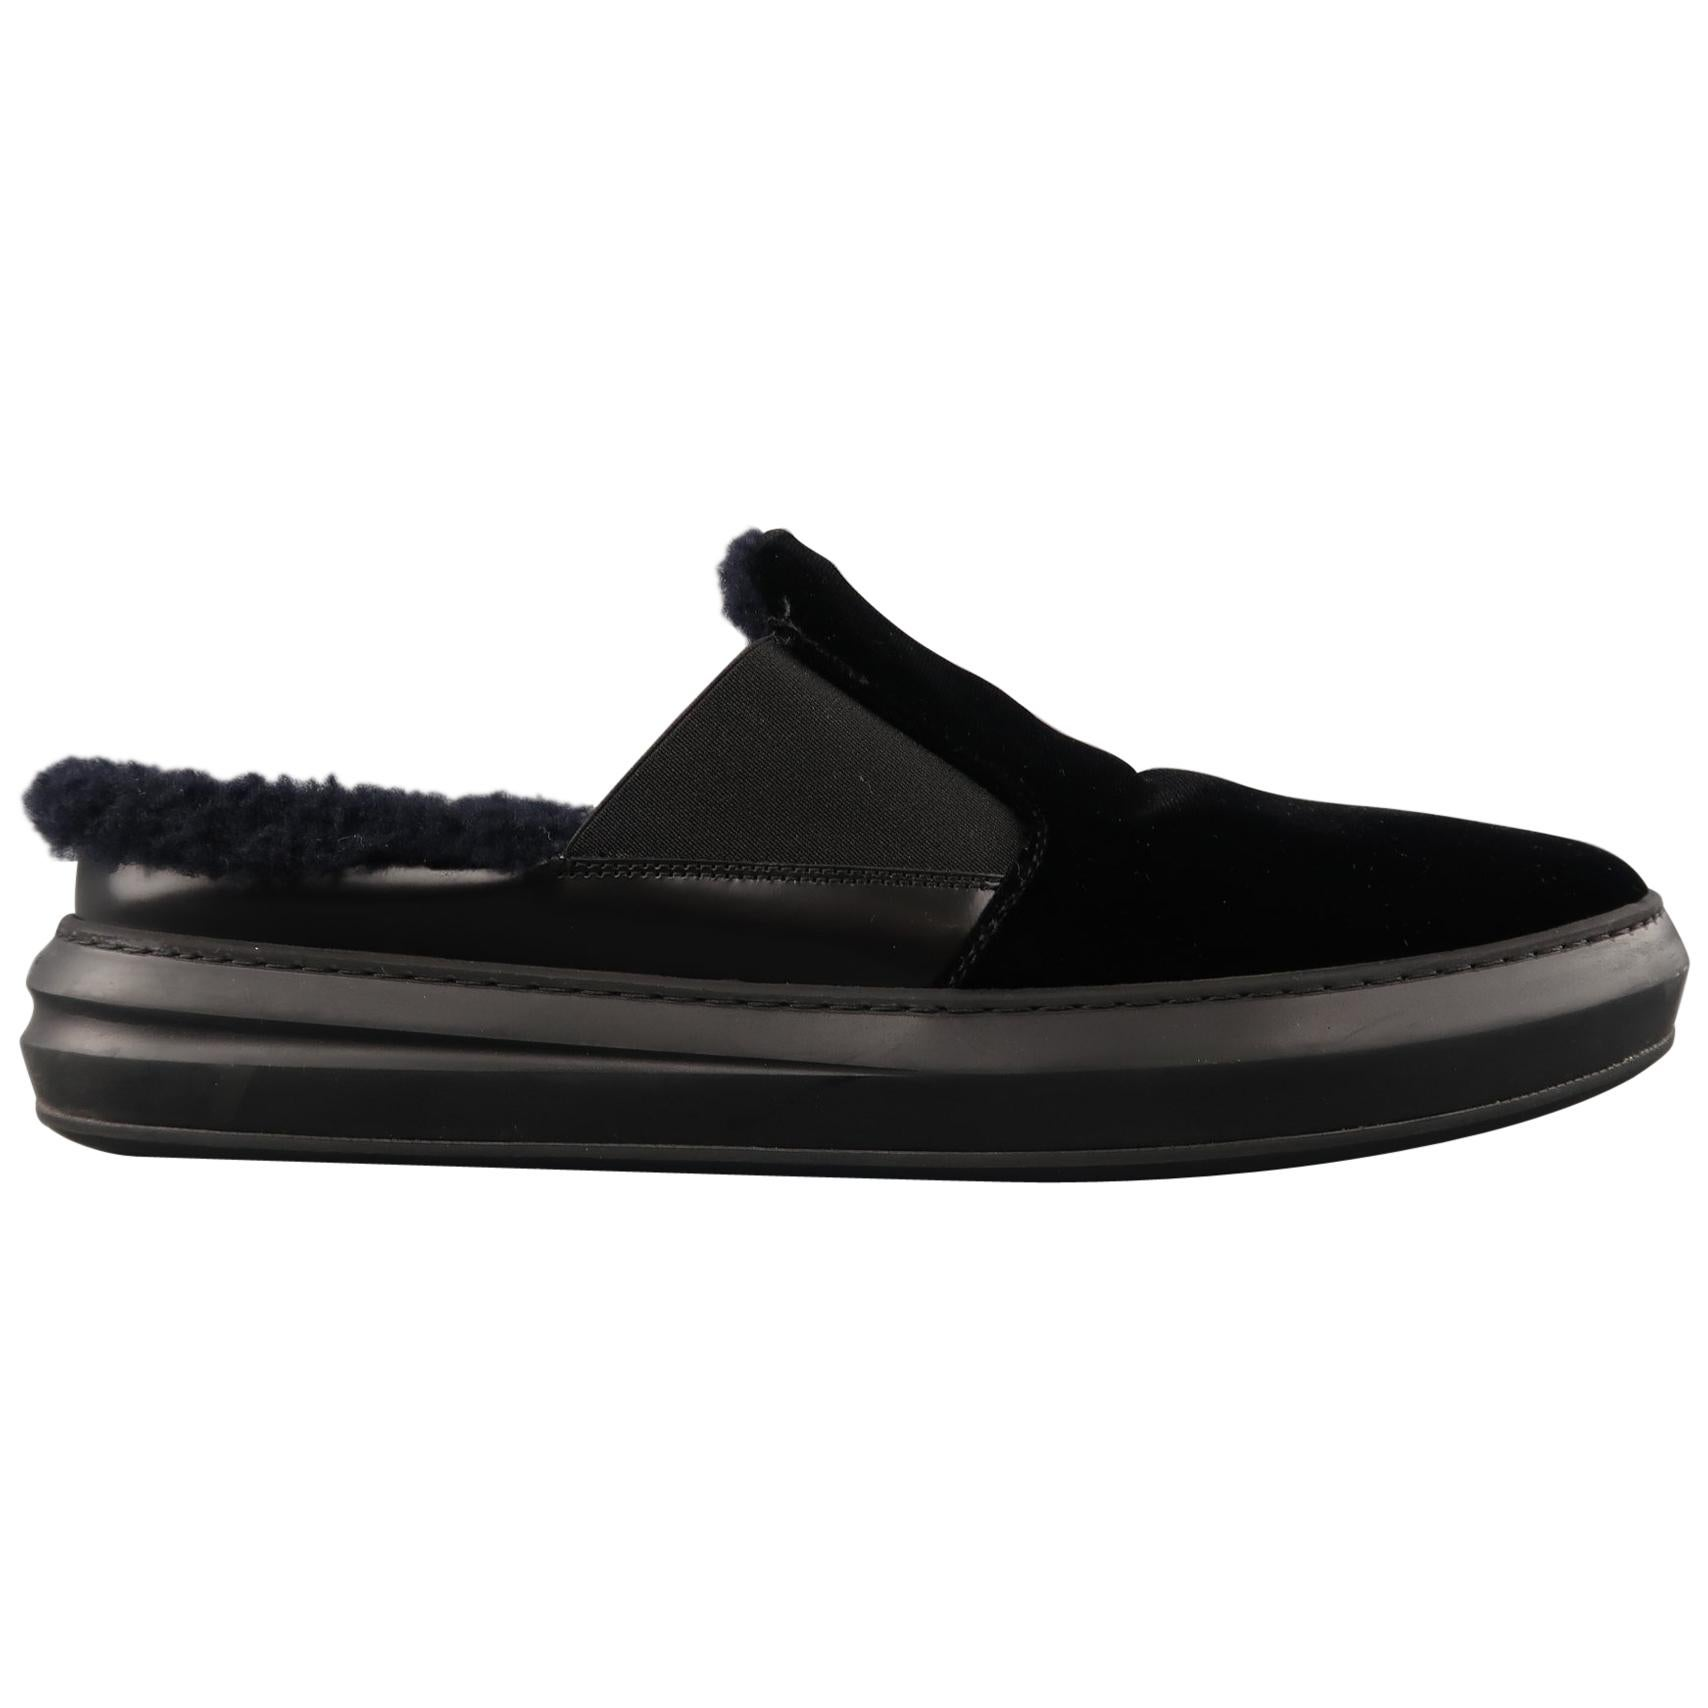 SALVATORE FERRAGAMO Size 11 Black Velvet Fur Lined Slip Loafers